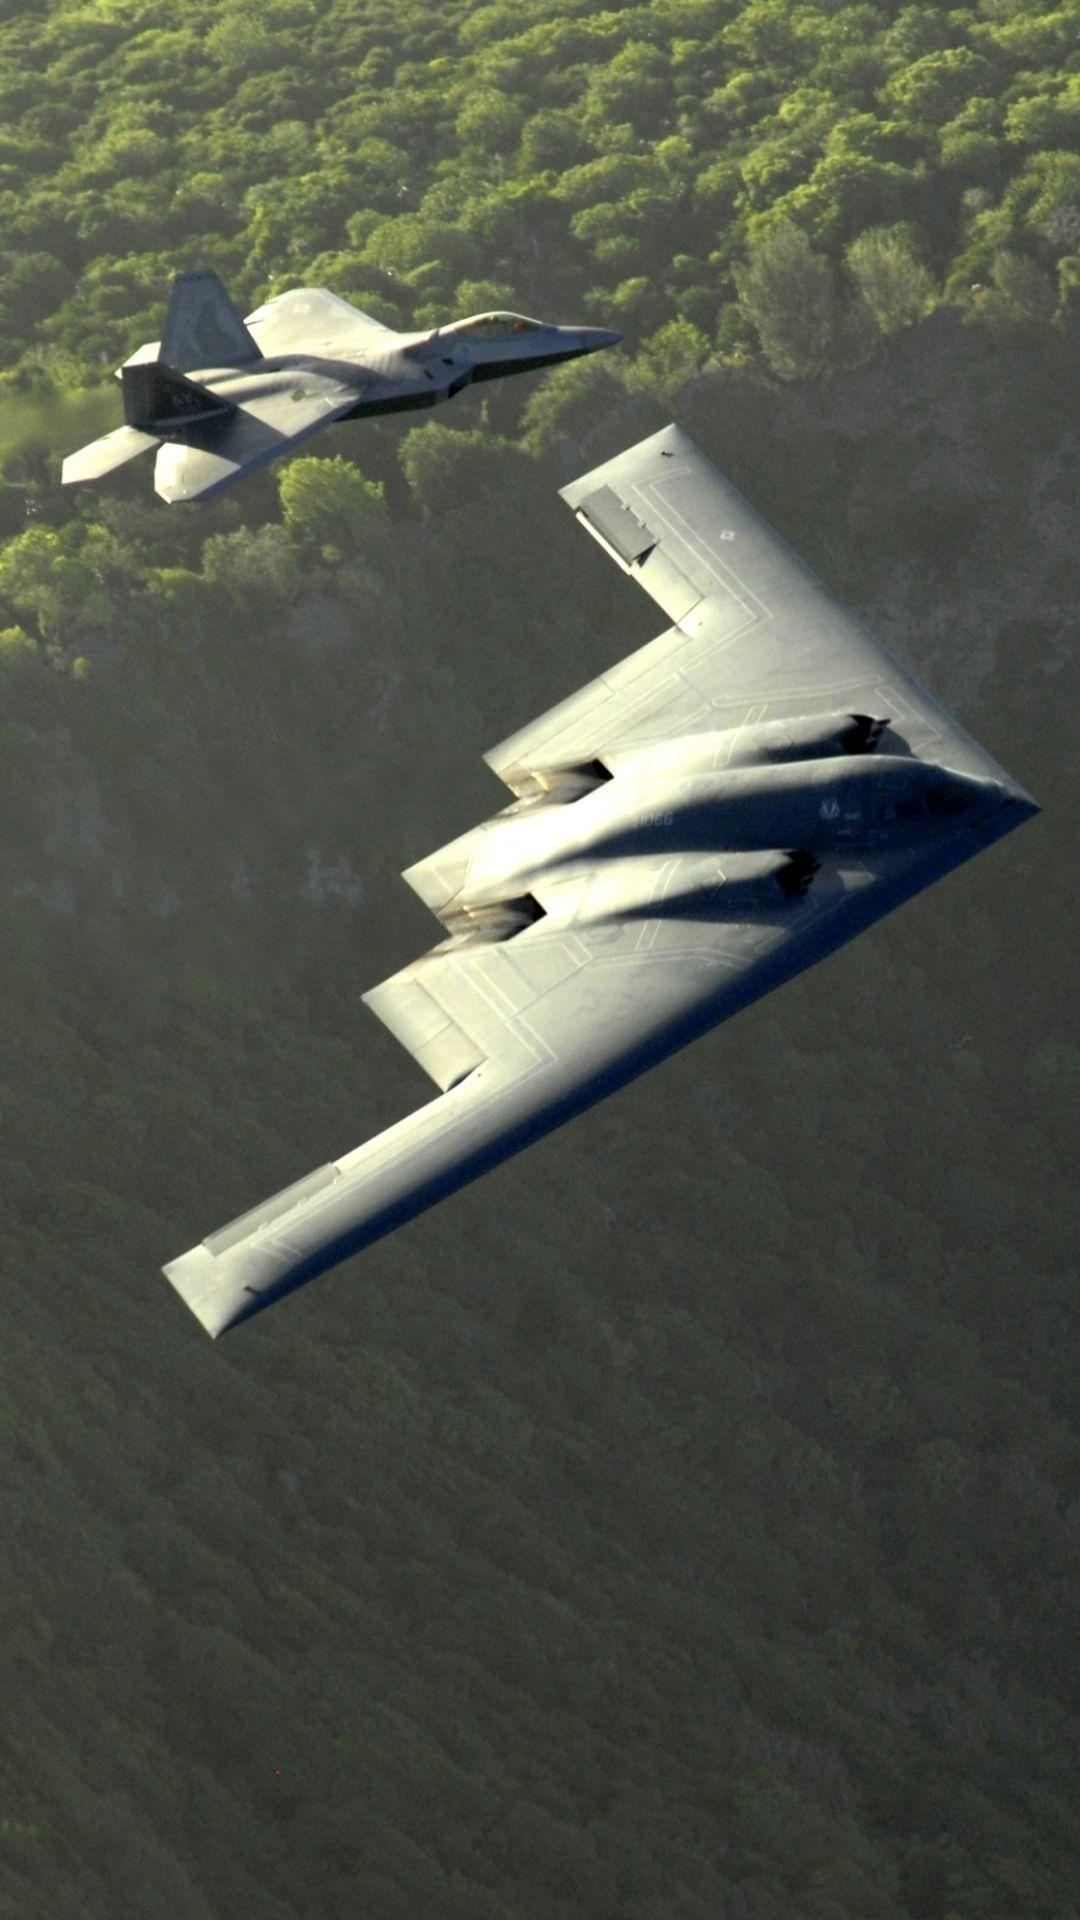 Download this Wallpaper 1080x1920   MilitaryNorthrop Grumman B 2 1080x1920